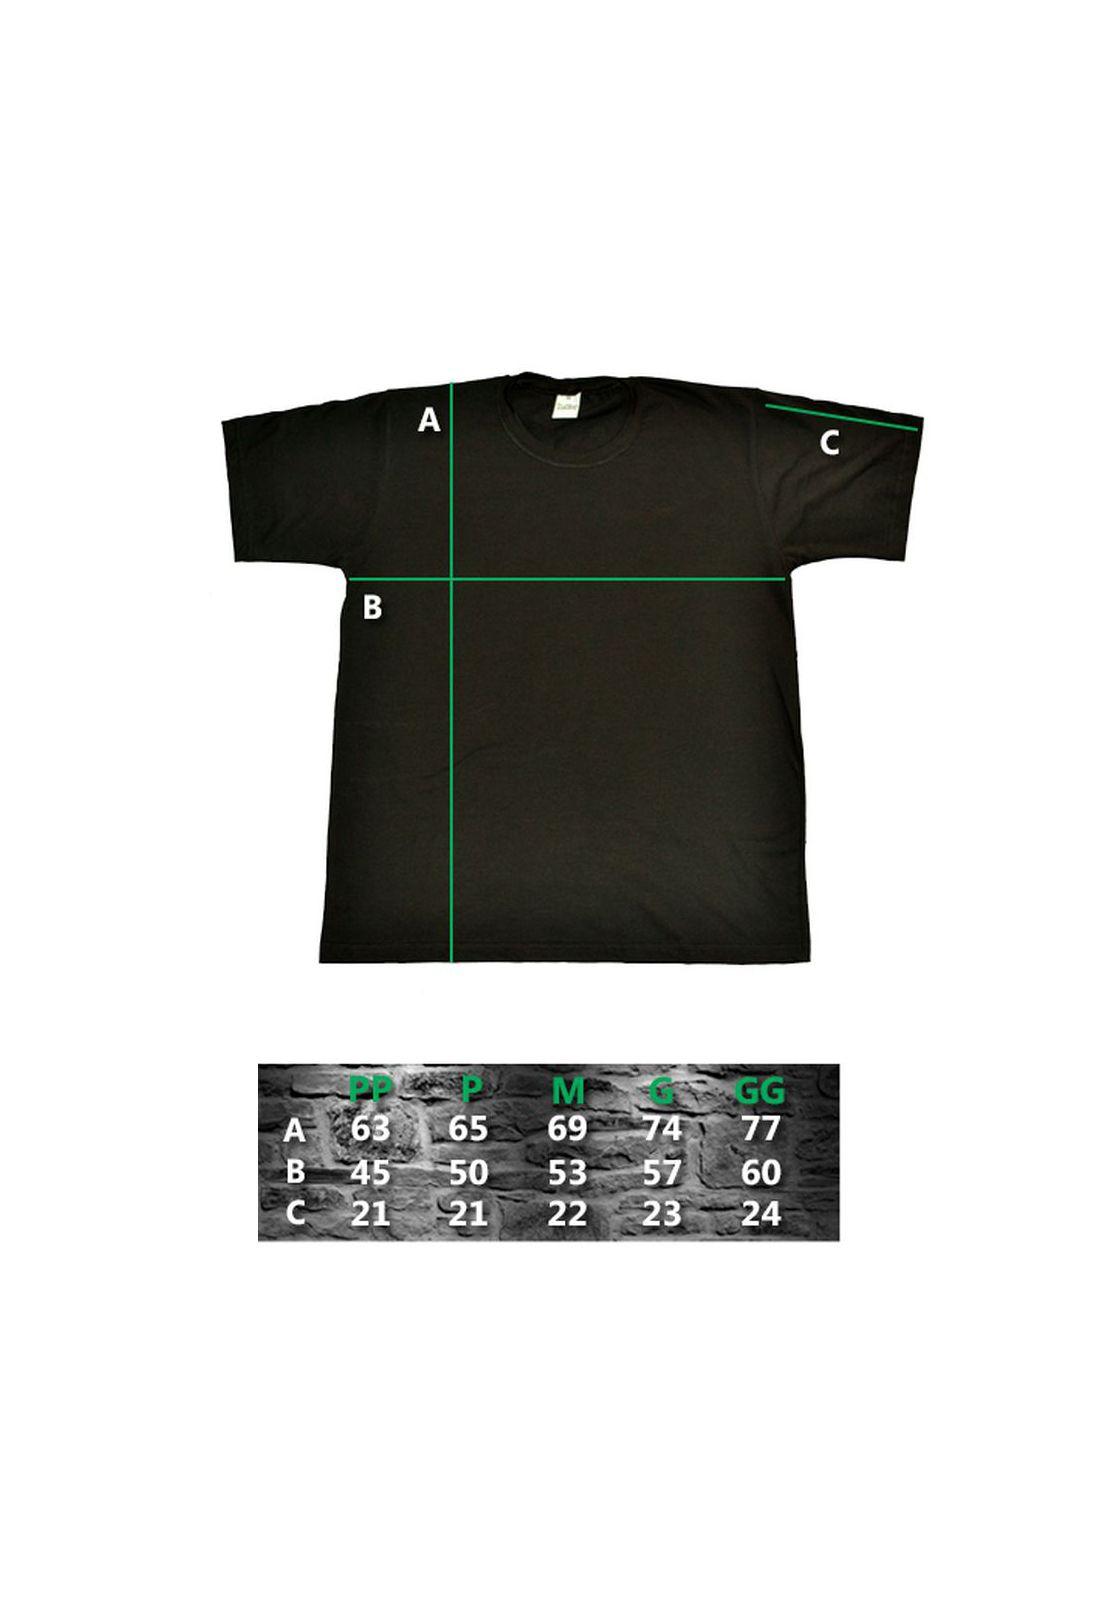 Camiseta Jason - Sexta Feira 13  - HShop